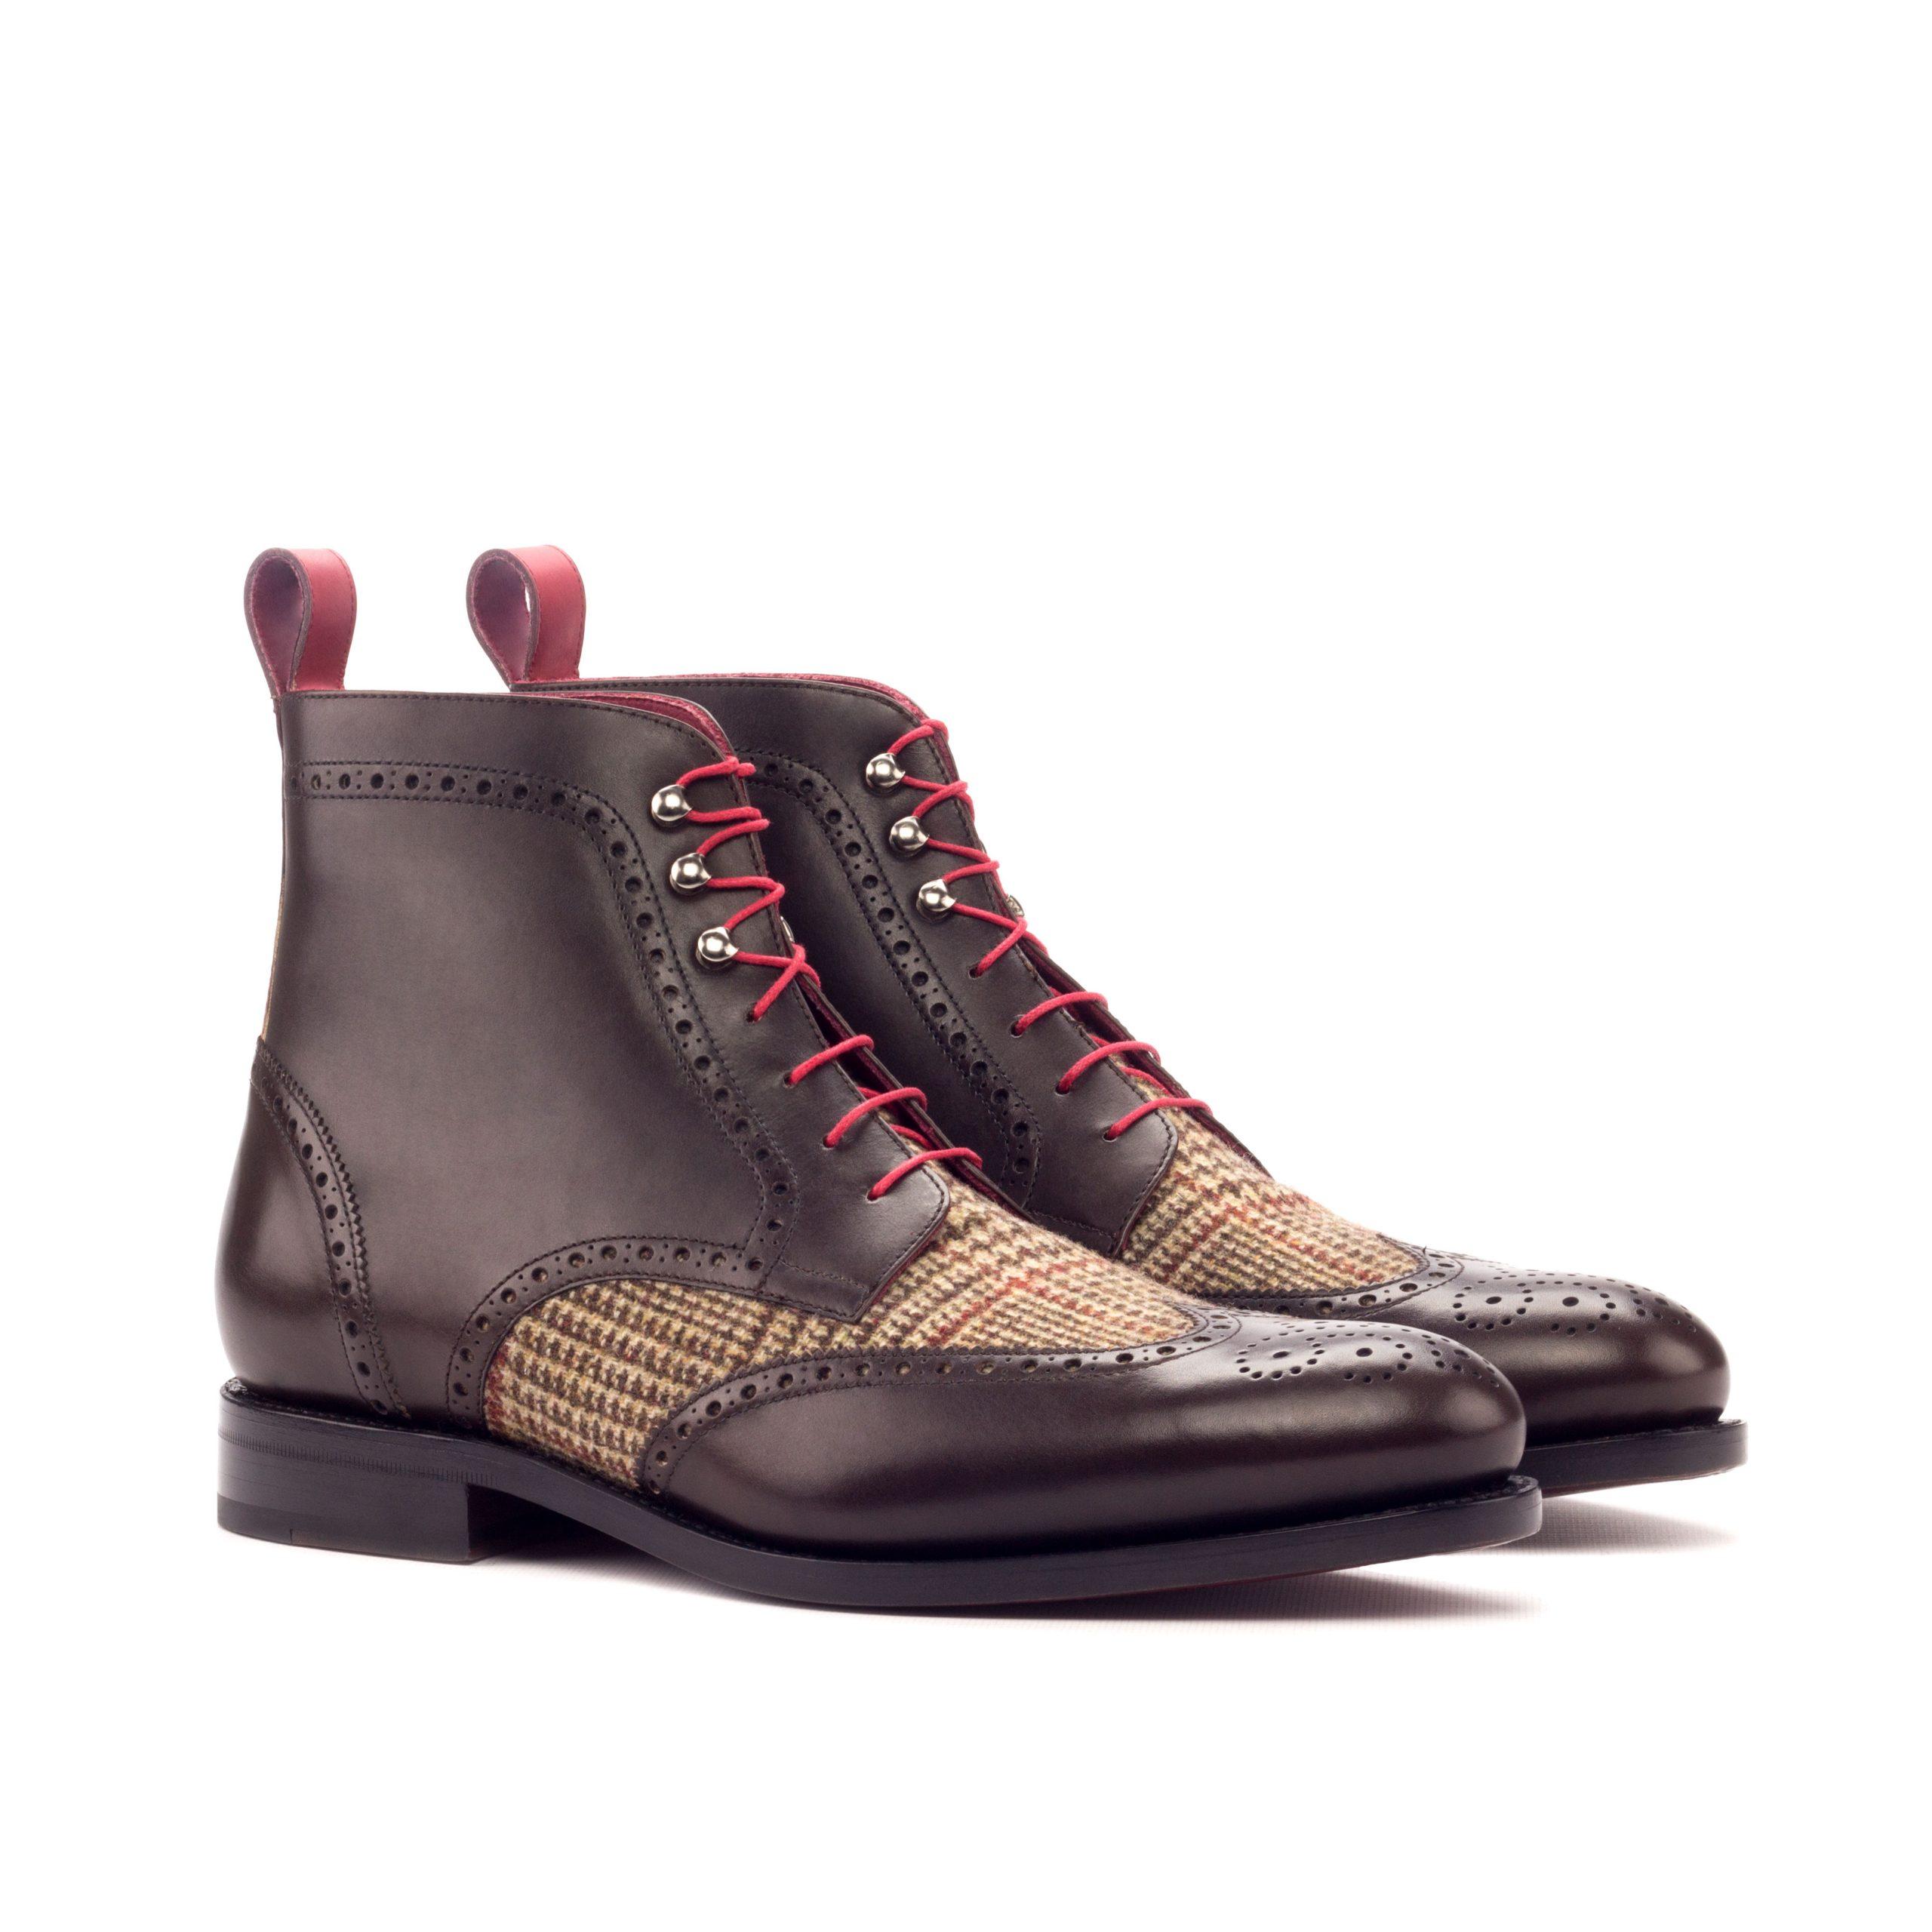 Military Boot Goodyear Welted - Painted Calf Dark Brown-Painted Calf Red-Wool Tweed Brown-Ang5